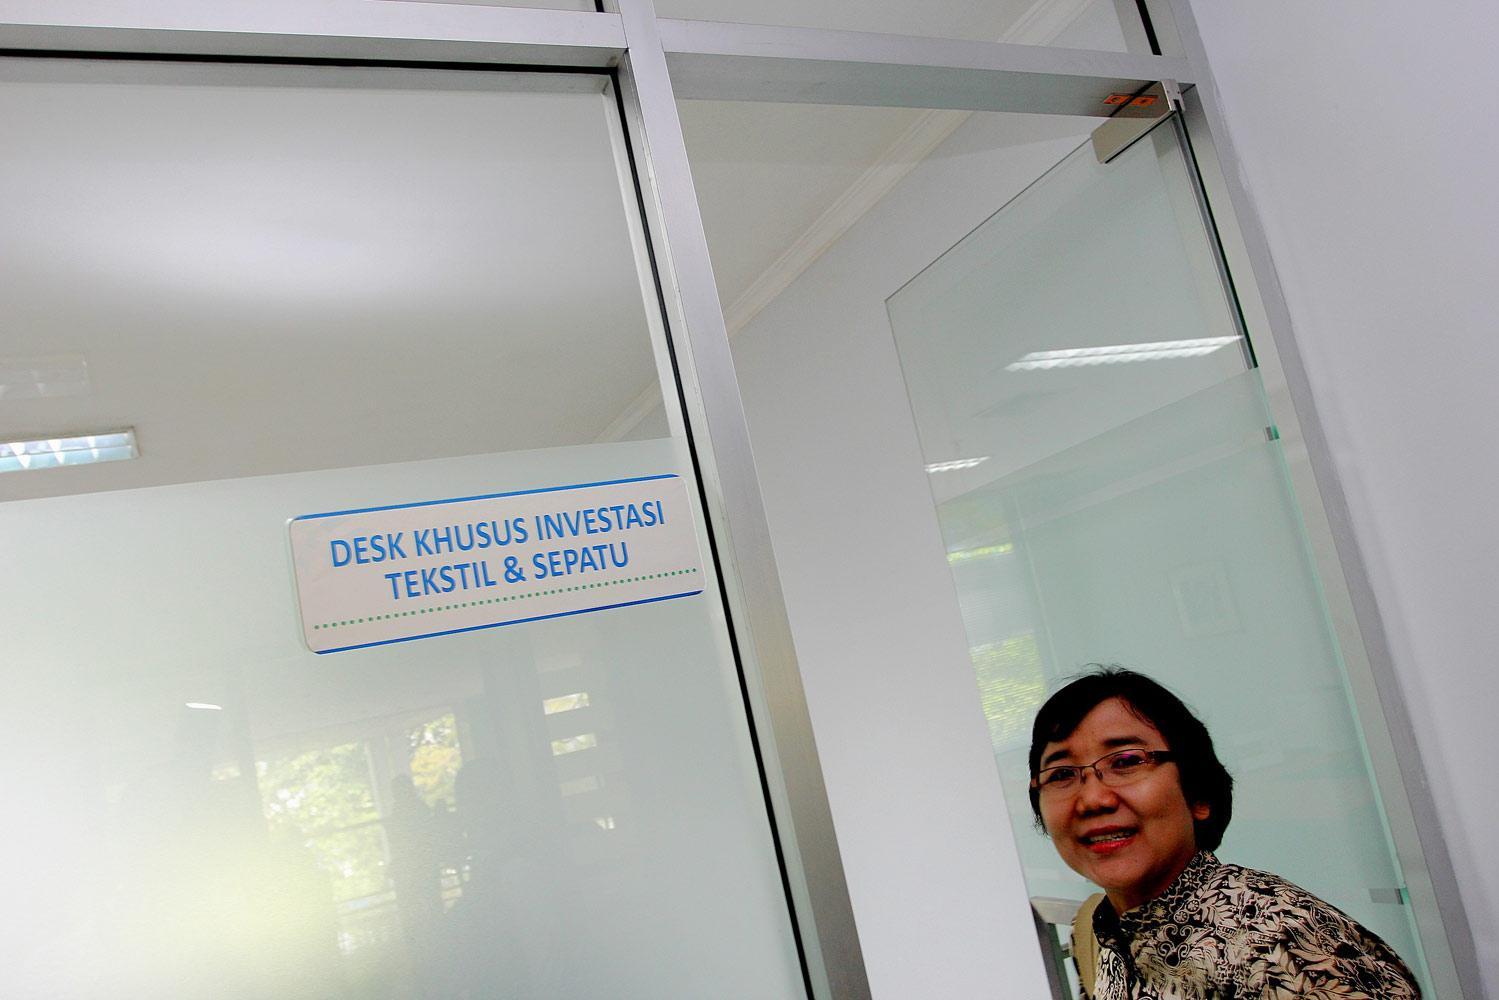 Suasana loket ruangan Desk Investasi Khusus Tekstil dan Sepatu BKPM di Jakarta, Jumat, (09/10).